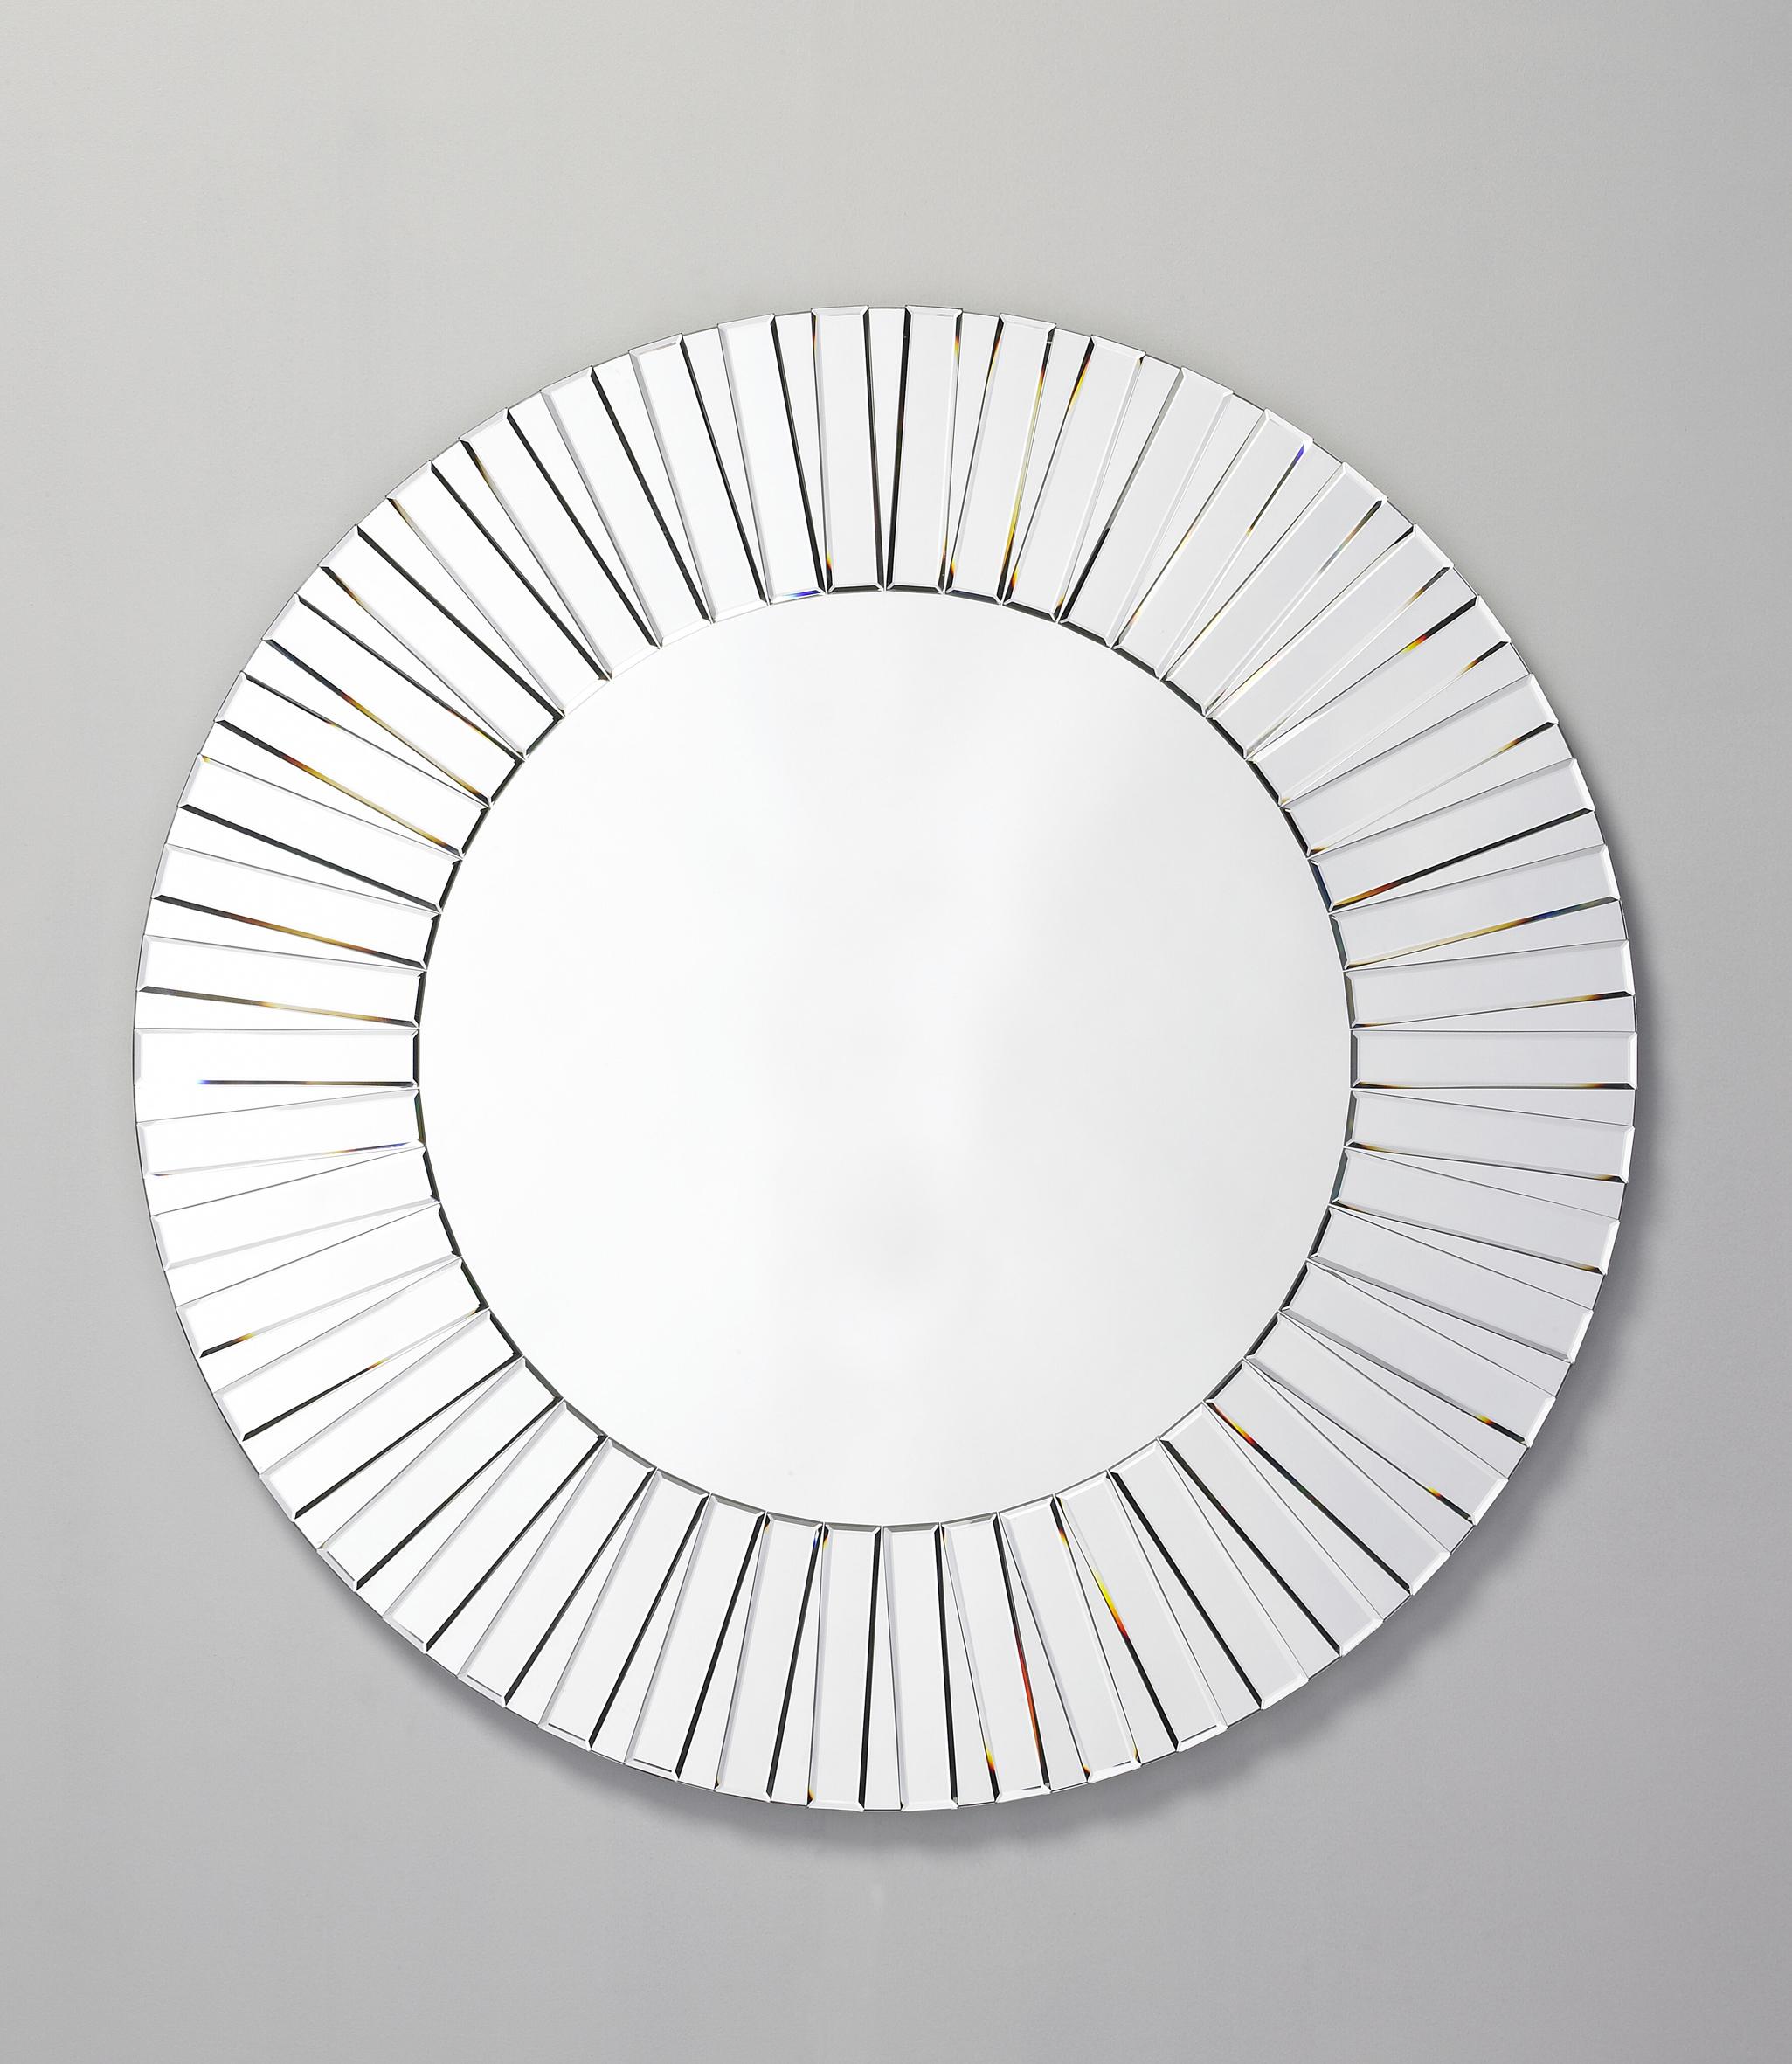 sunshine mirror round mirror denelli italia. Black Bedroom Furniture Sets. Home Design Ideas